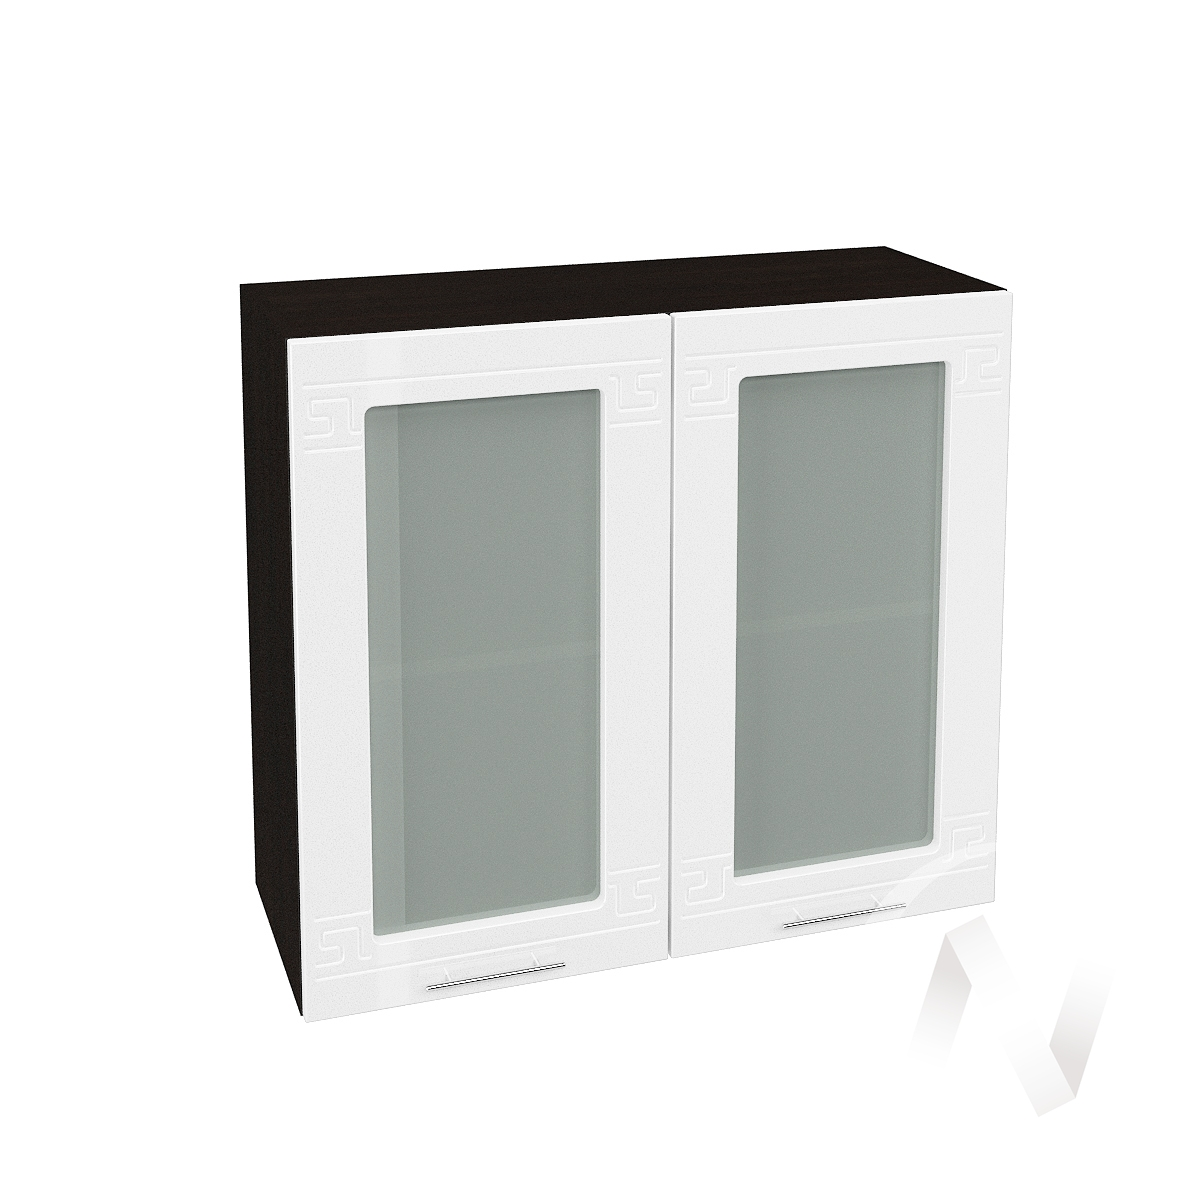 "Кухня ""Греция"": Шкаф верхний со стеклом 800, ШВС 800 (белый металлик/корпус венге)"